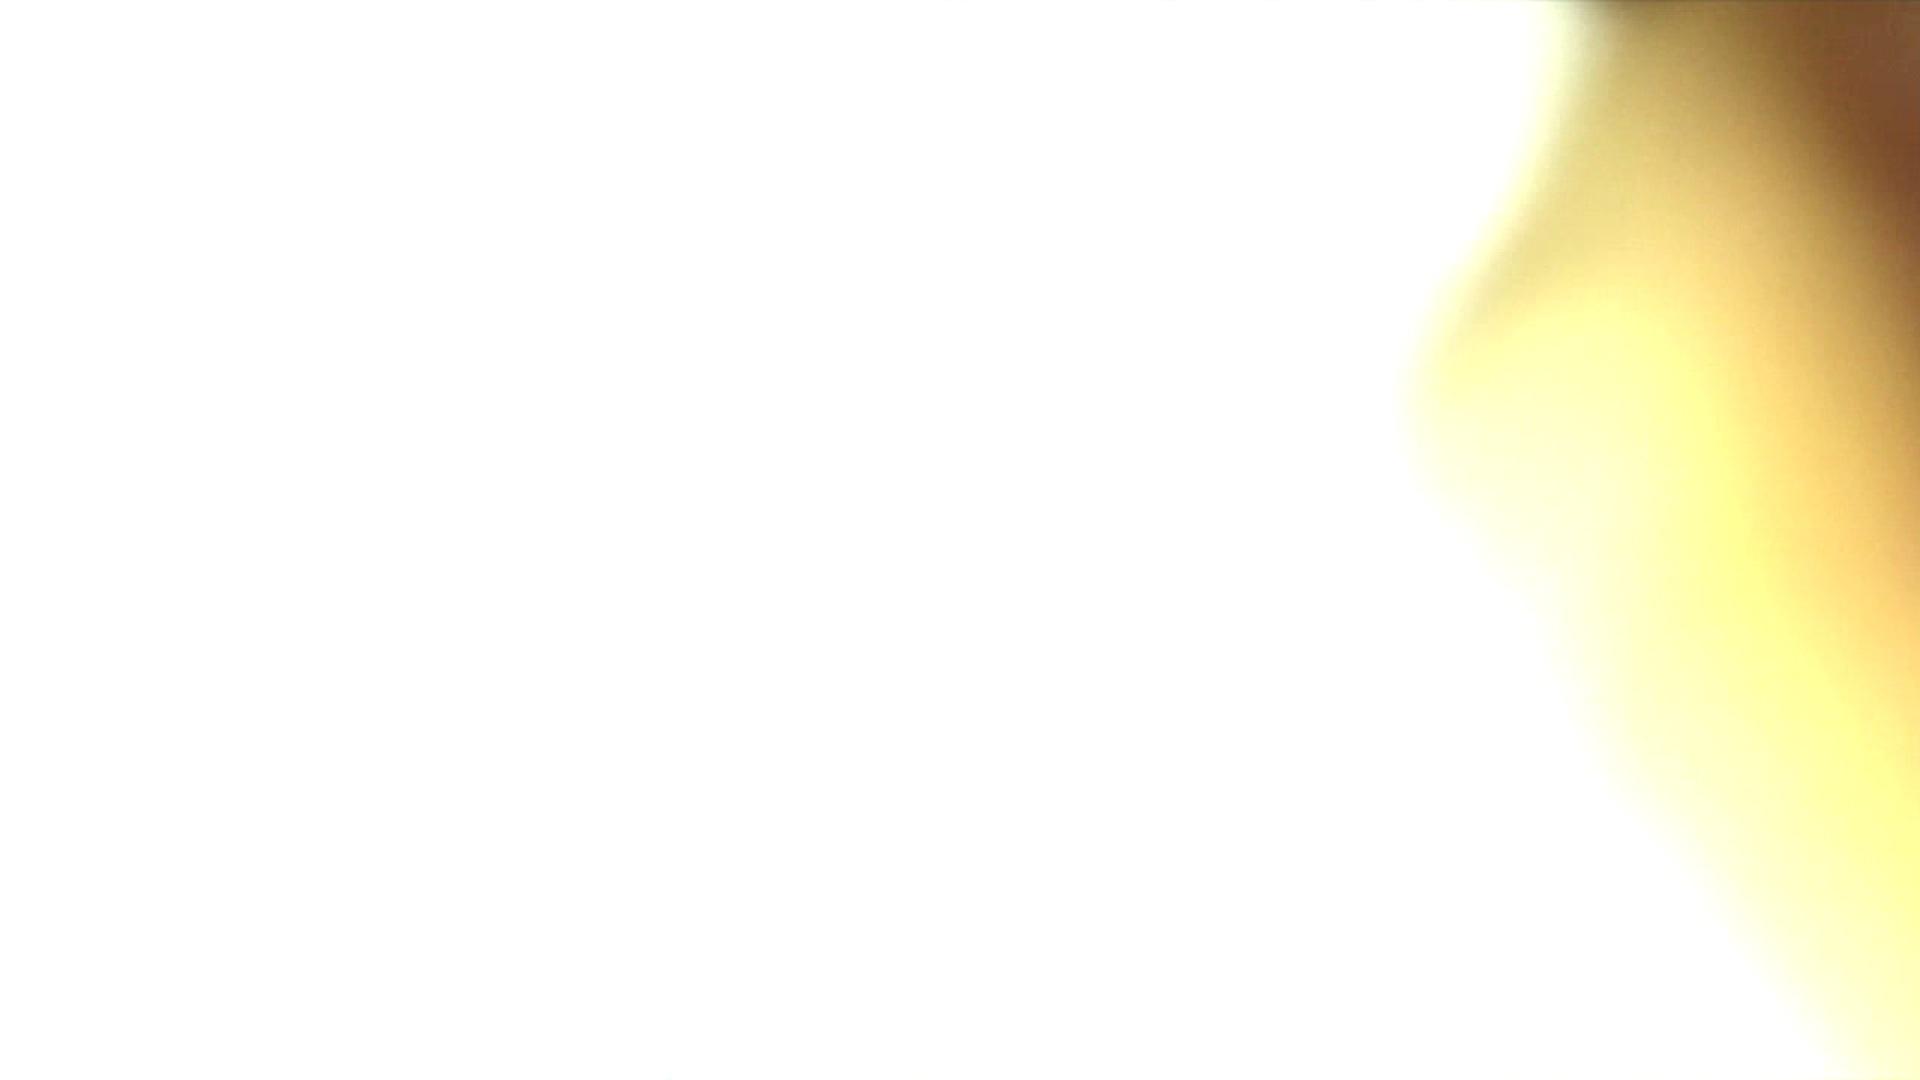 vol.22 【YHちゃん】パルコ店員20歳 mixiオフ会で 女子大生 セックス画像 77画像 69